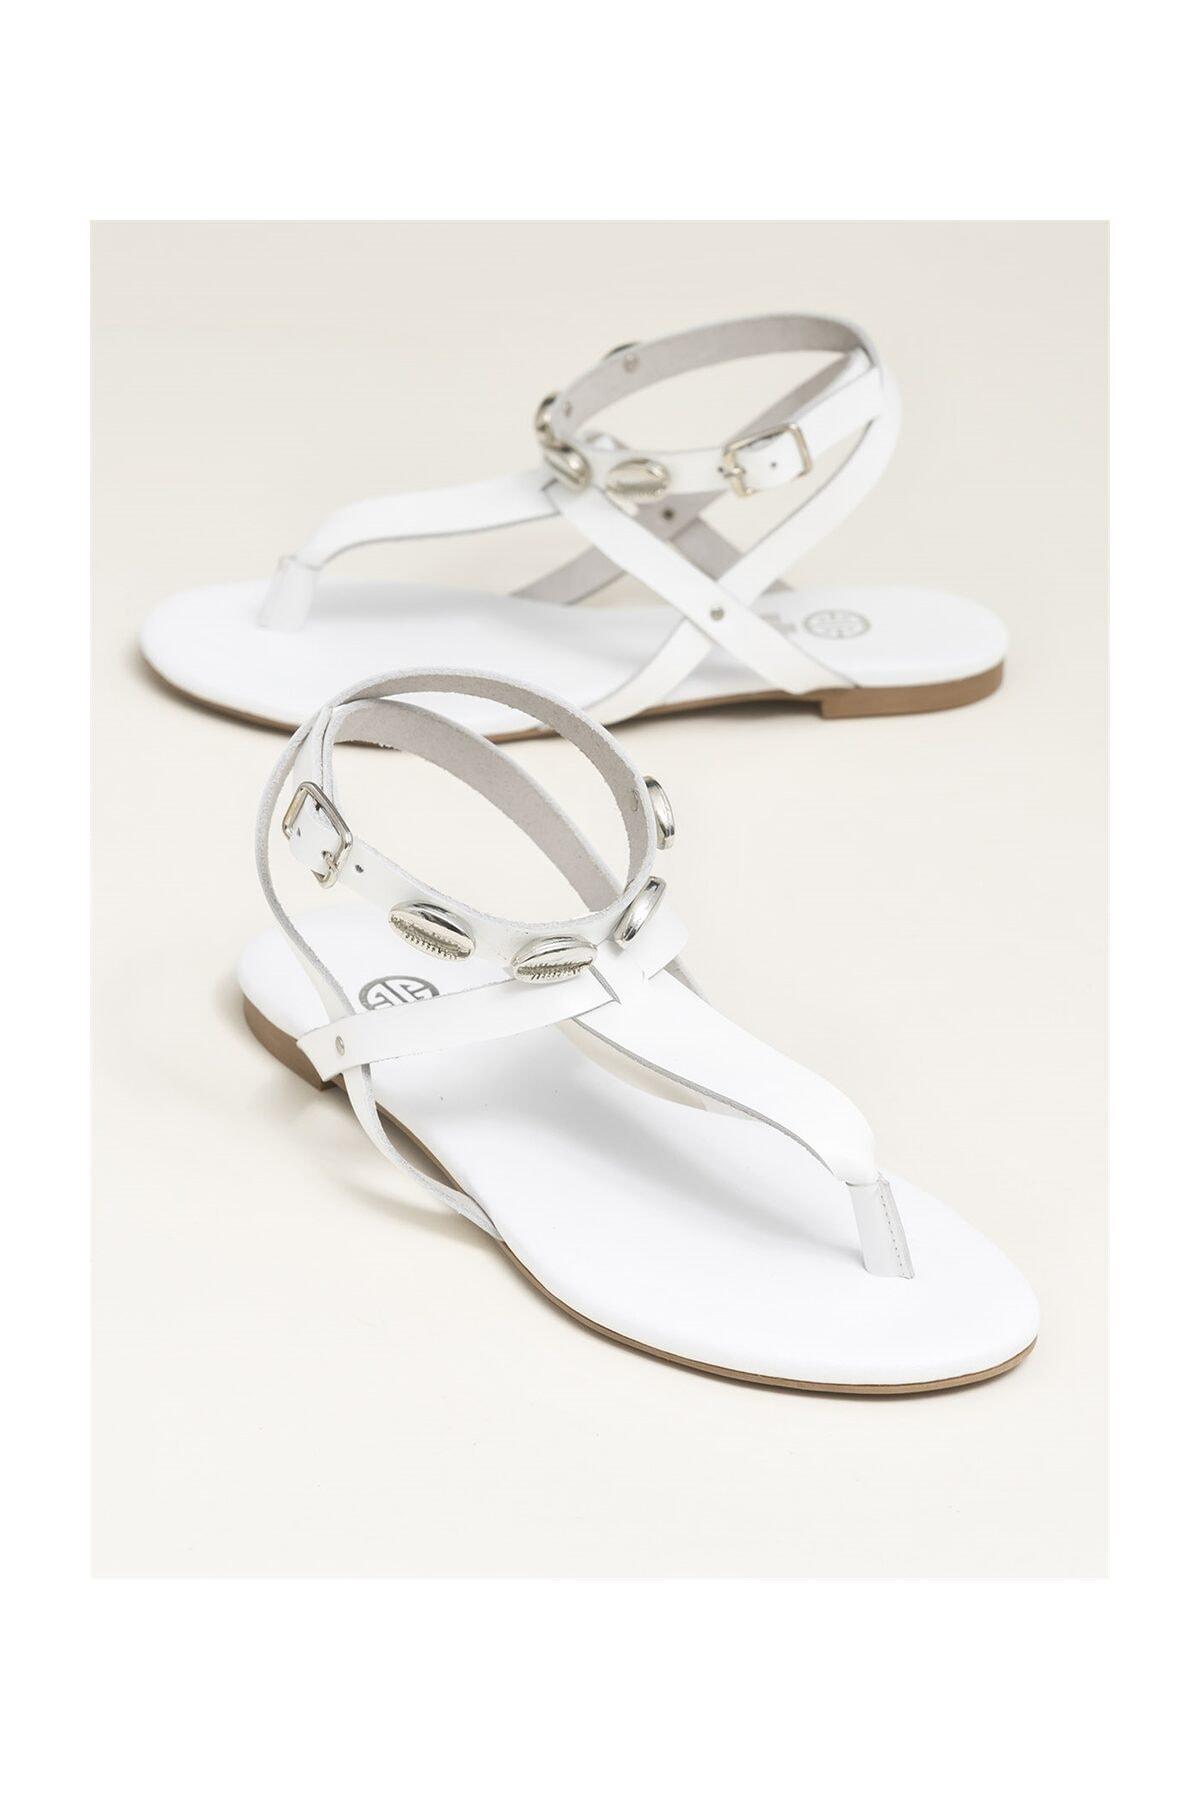 Elle Shoes Tate Kadın Sandalet 1